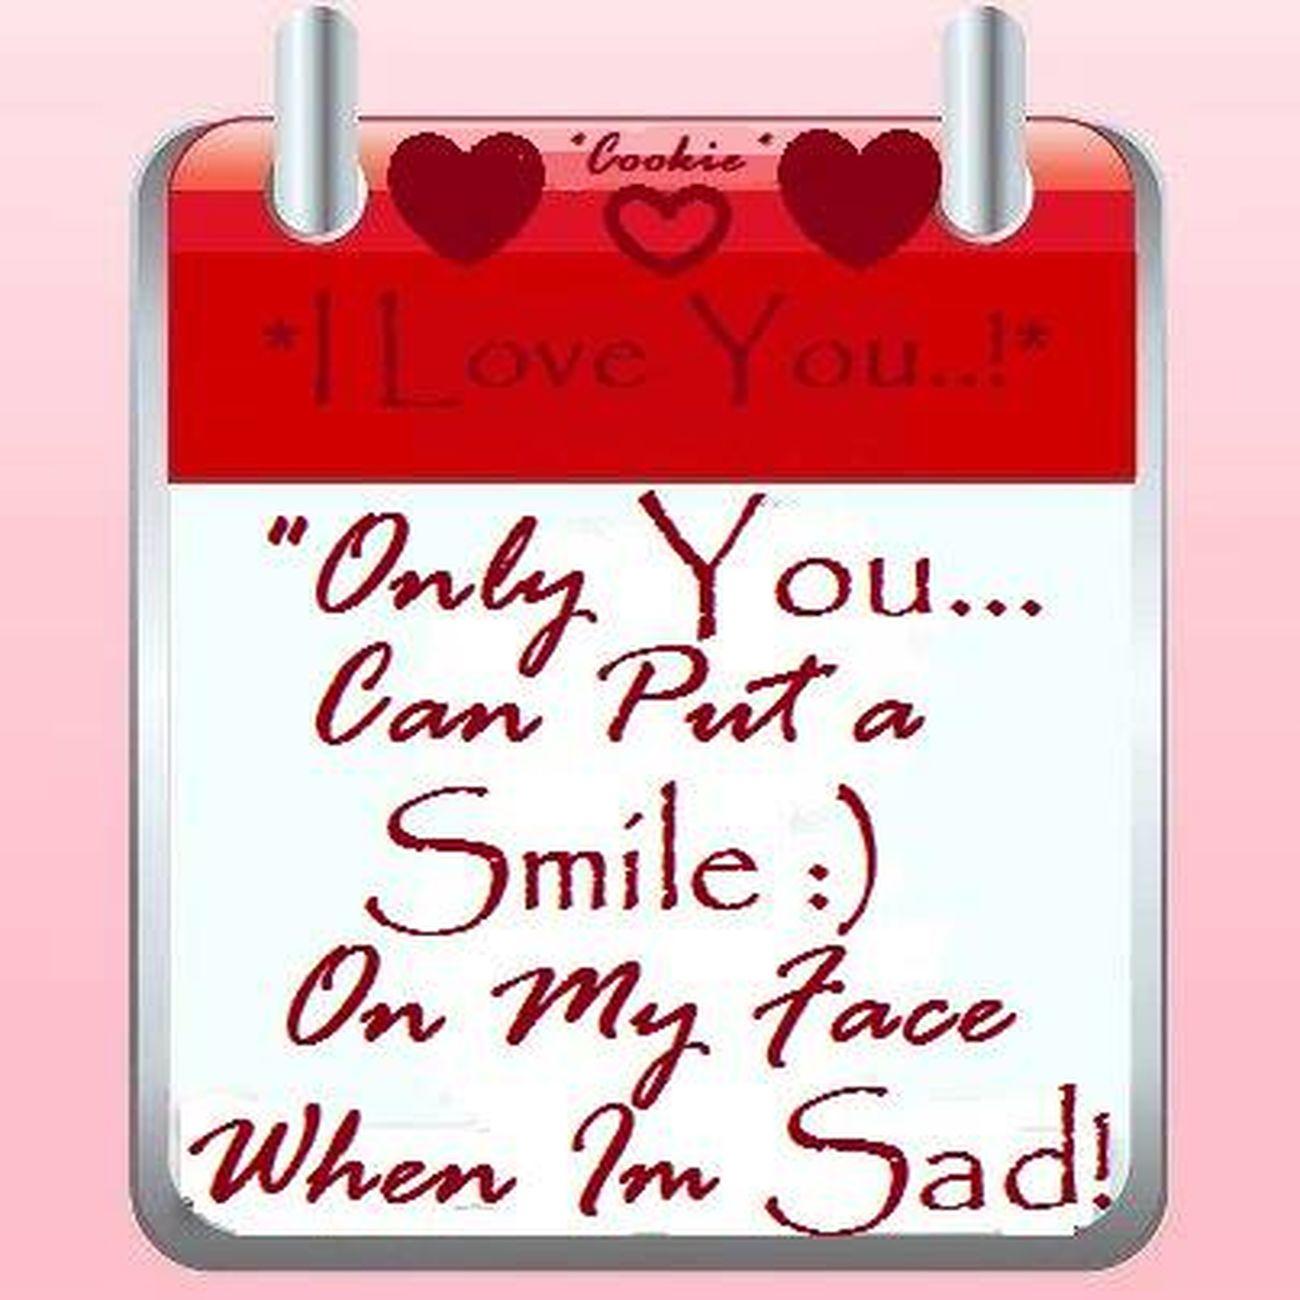 Feeling Sad But Smiling